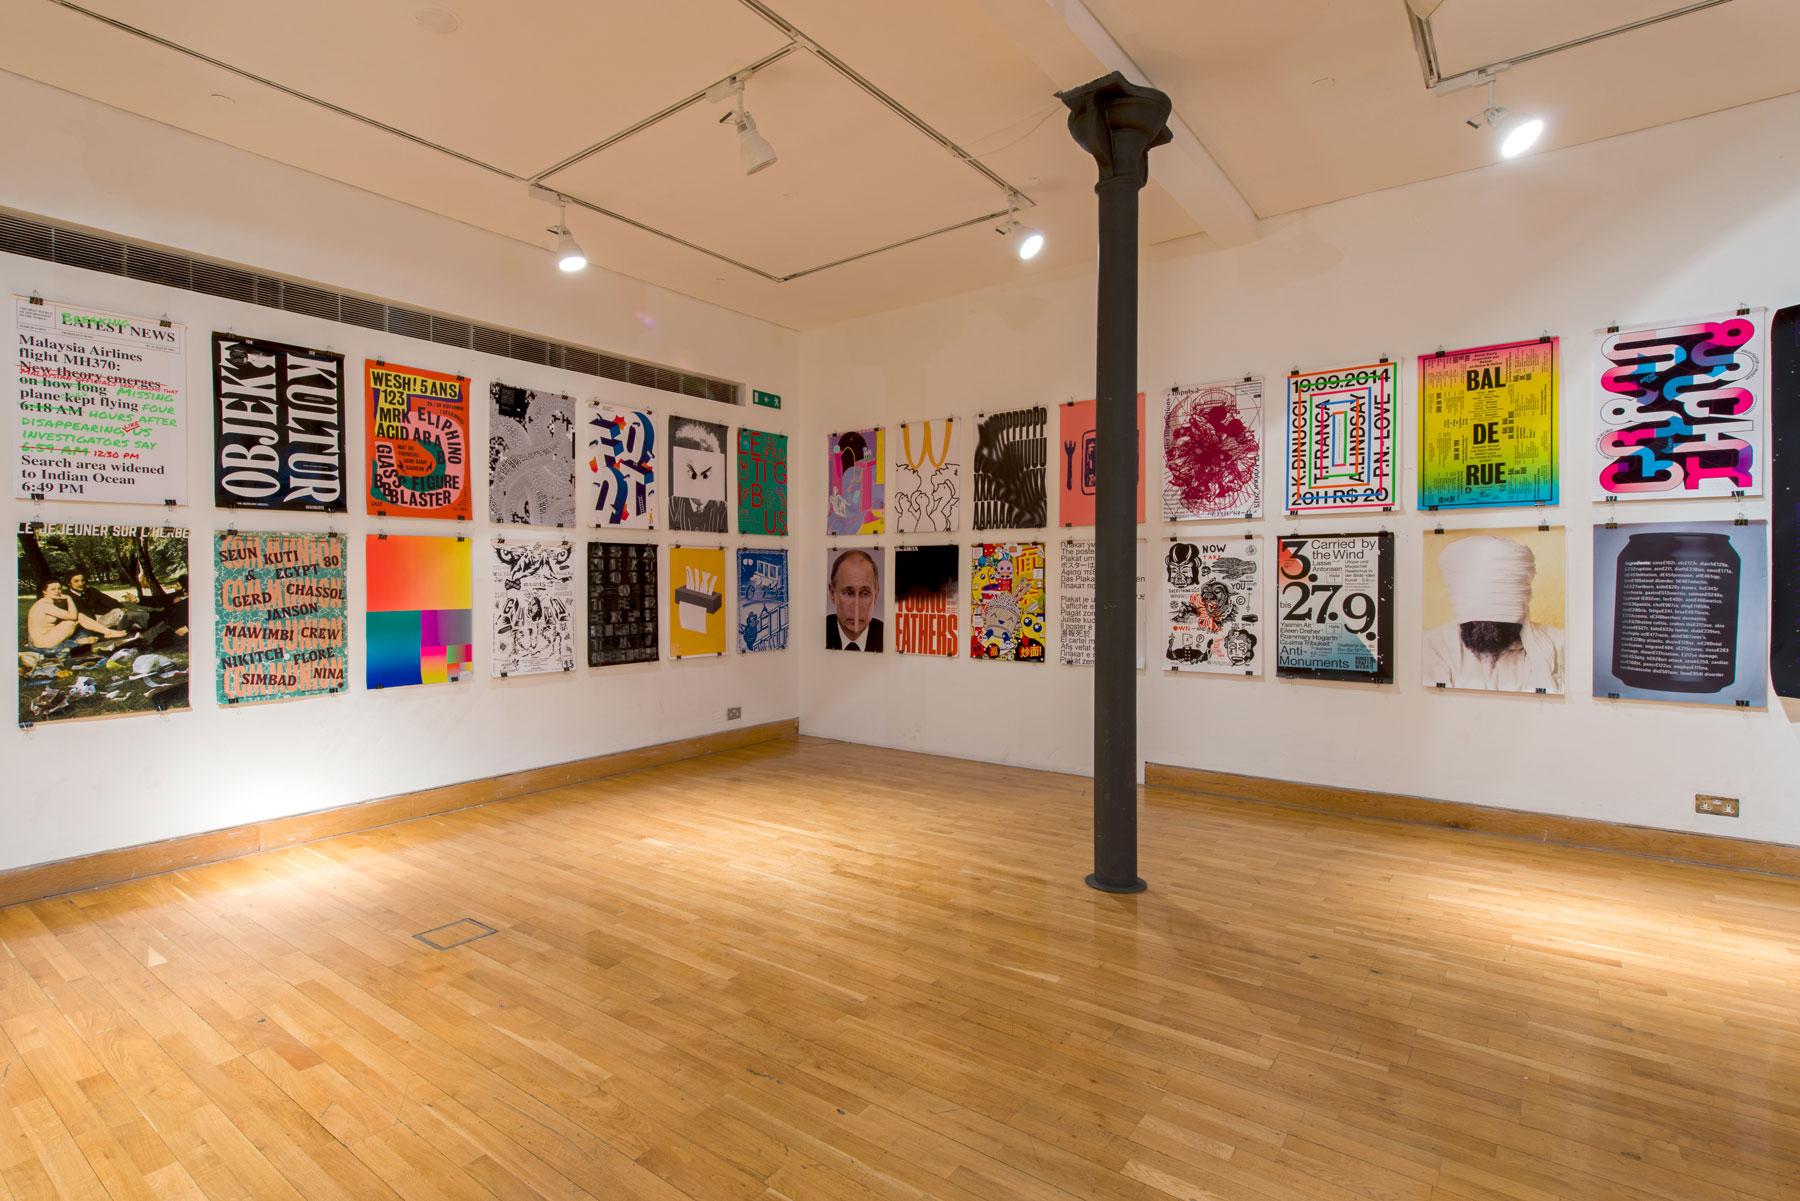 3graphic-design-festival-scotland-international-poster-exhib-15